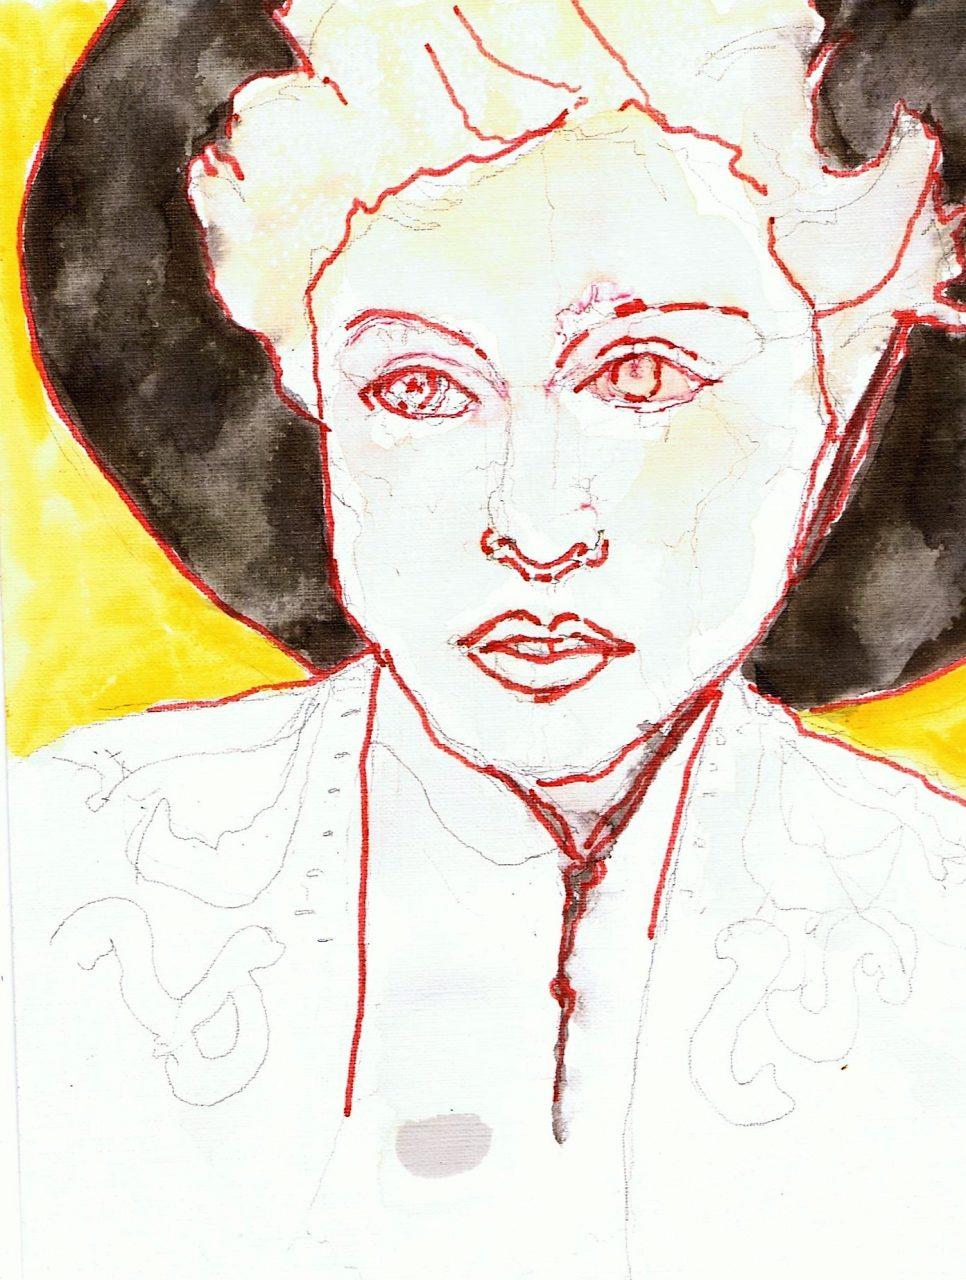 365 dagen een portret 161 Madonna, zangeres Viltstift en aquarel 19c25